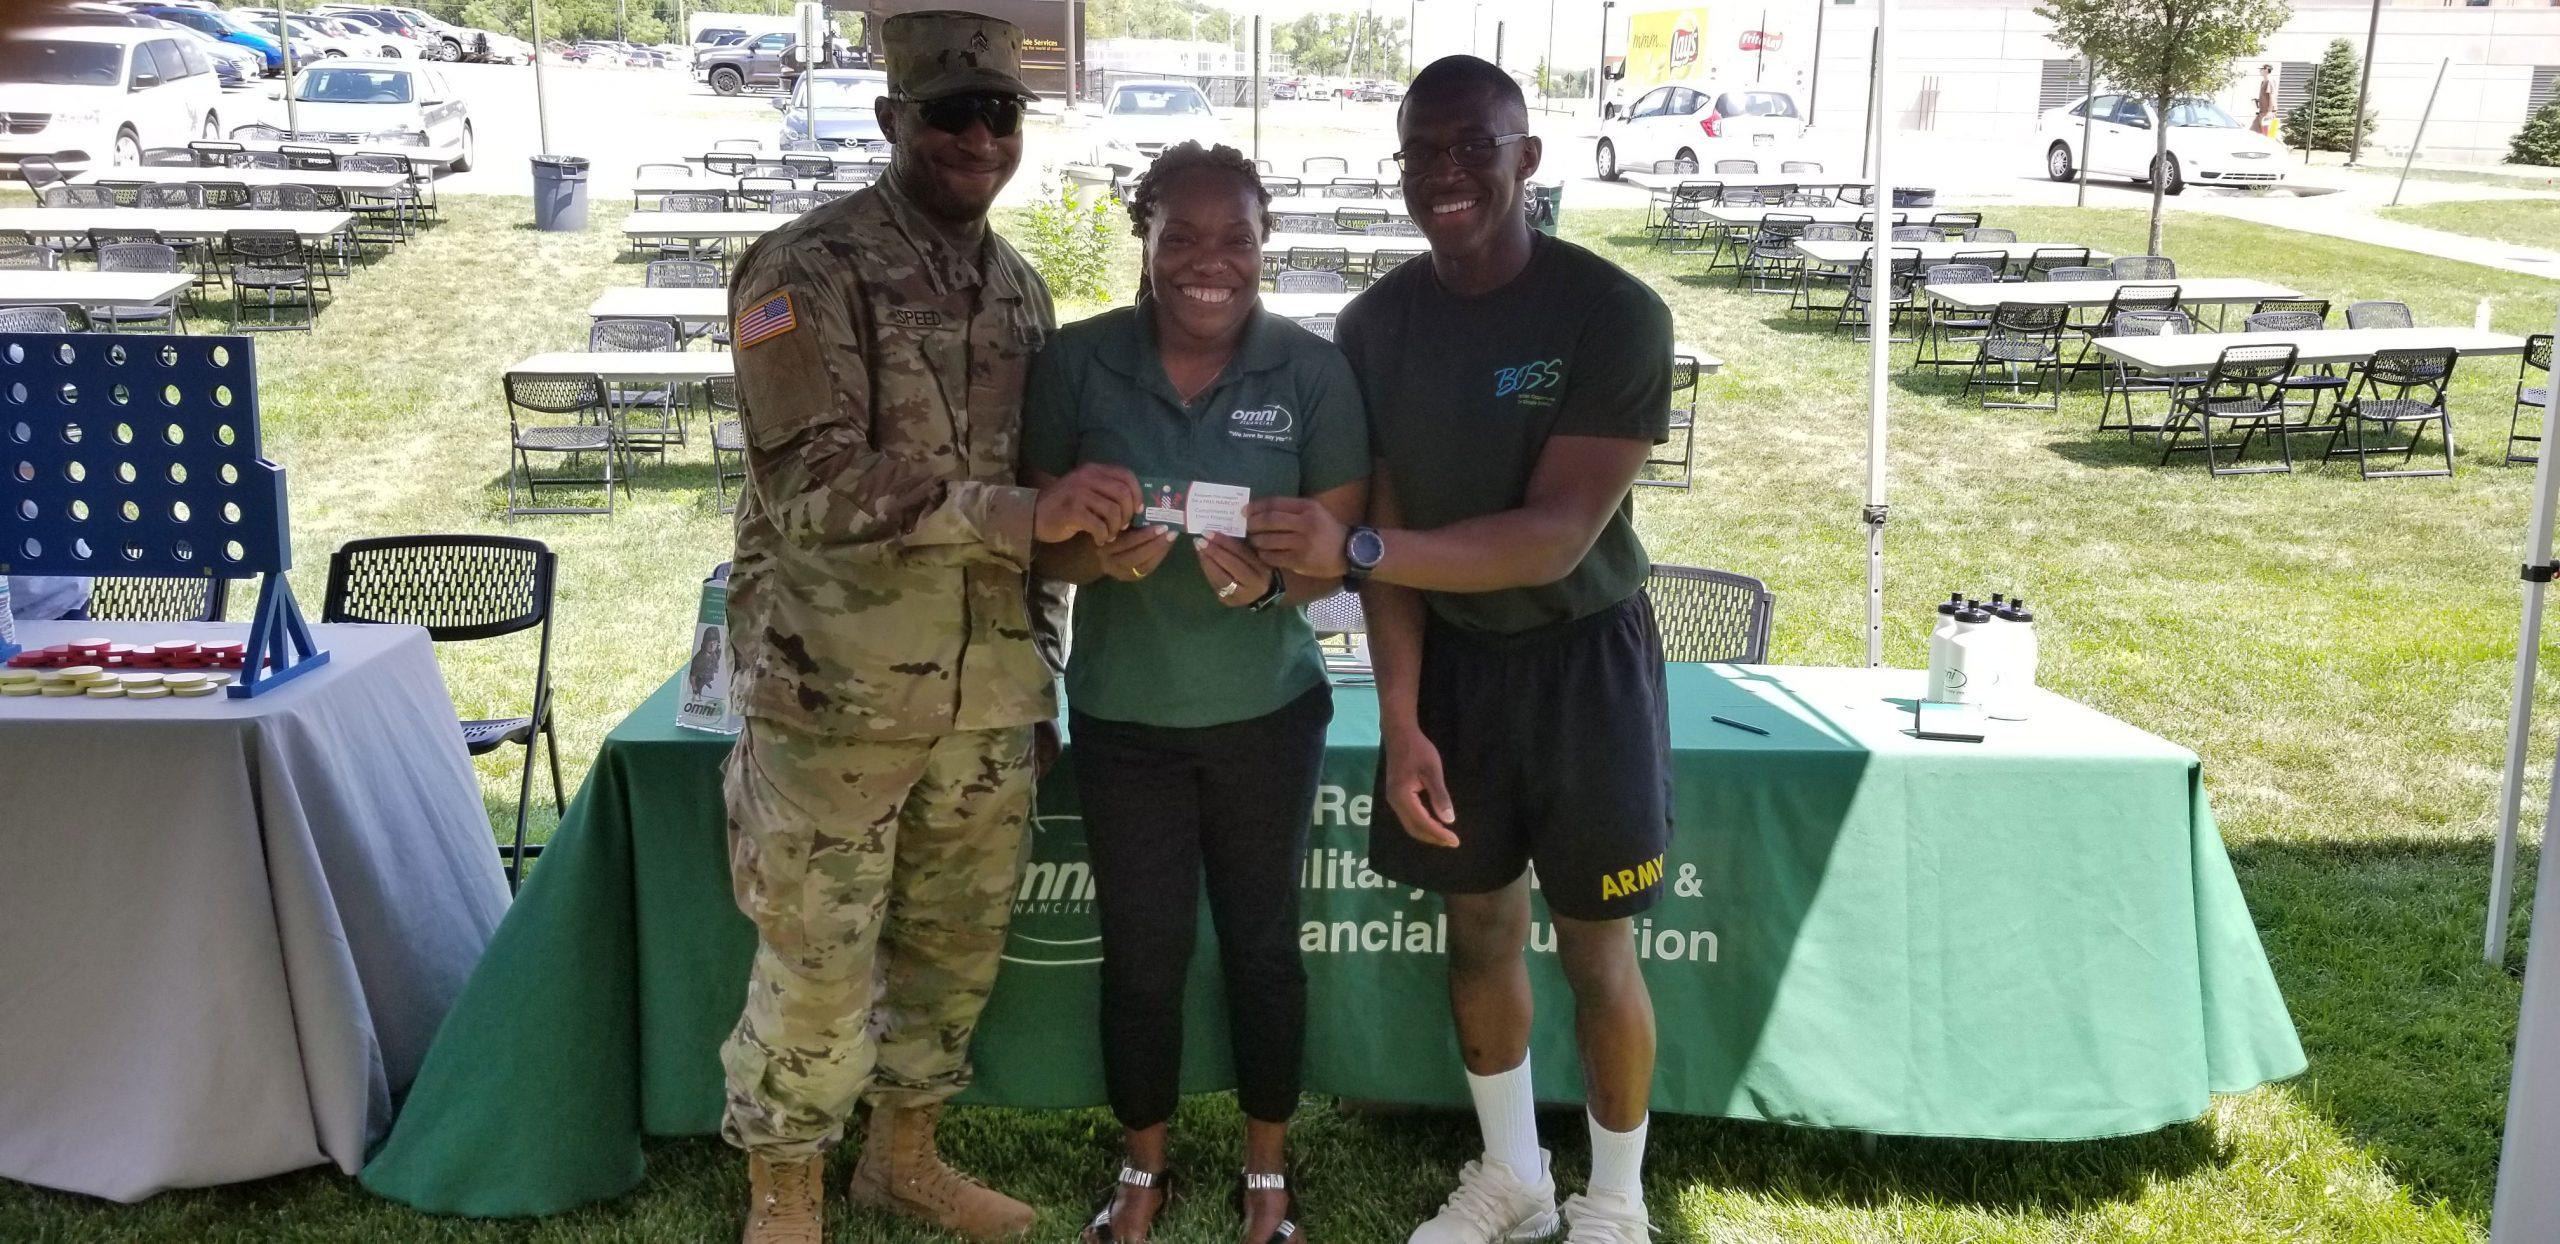 Omni Military Loans BOSS BBQ at Fort Riley in Junction City, Kansas sponsorship